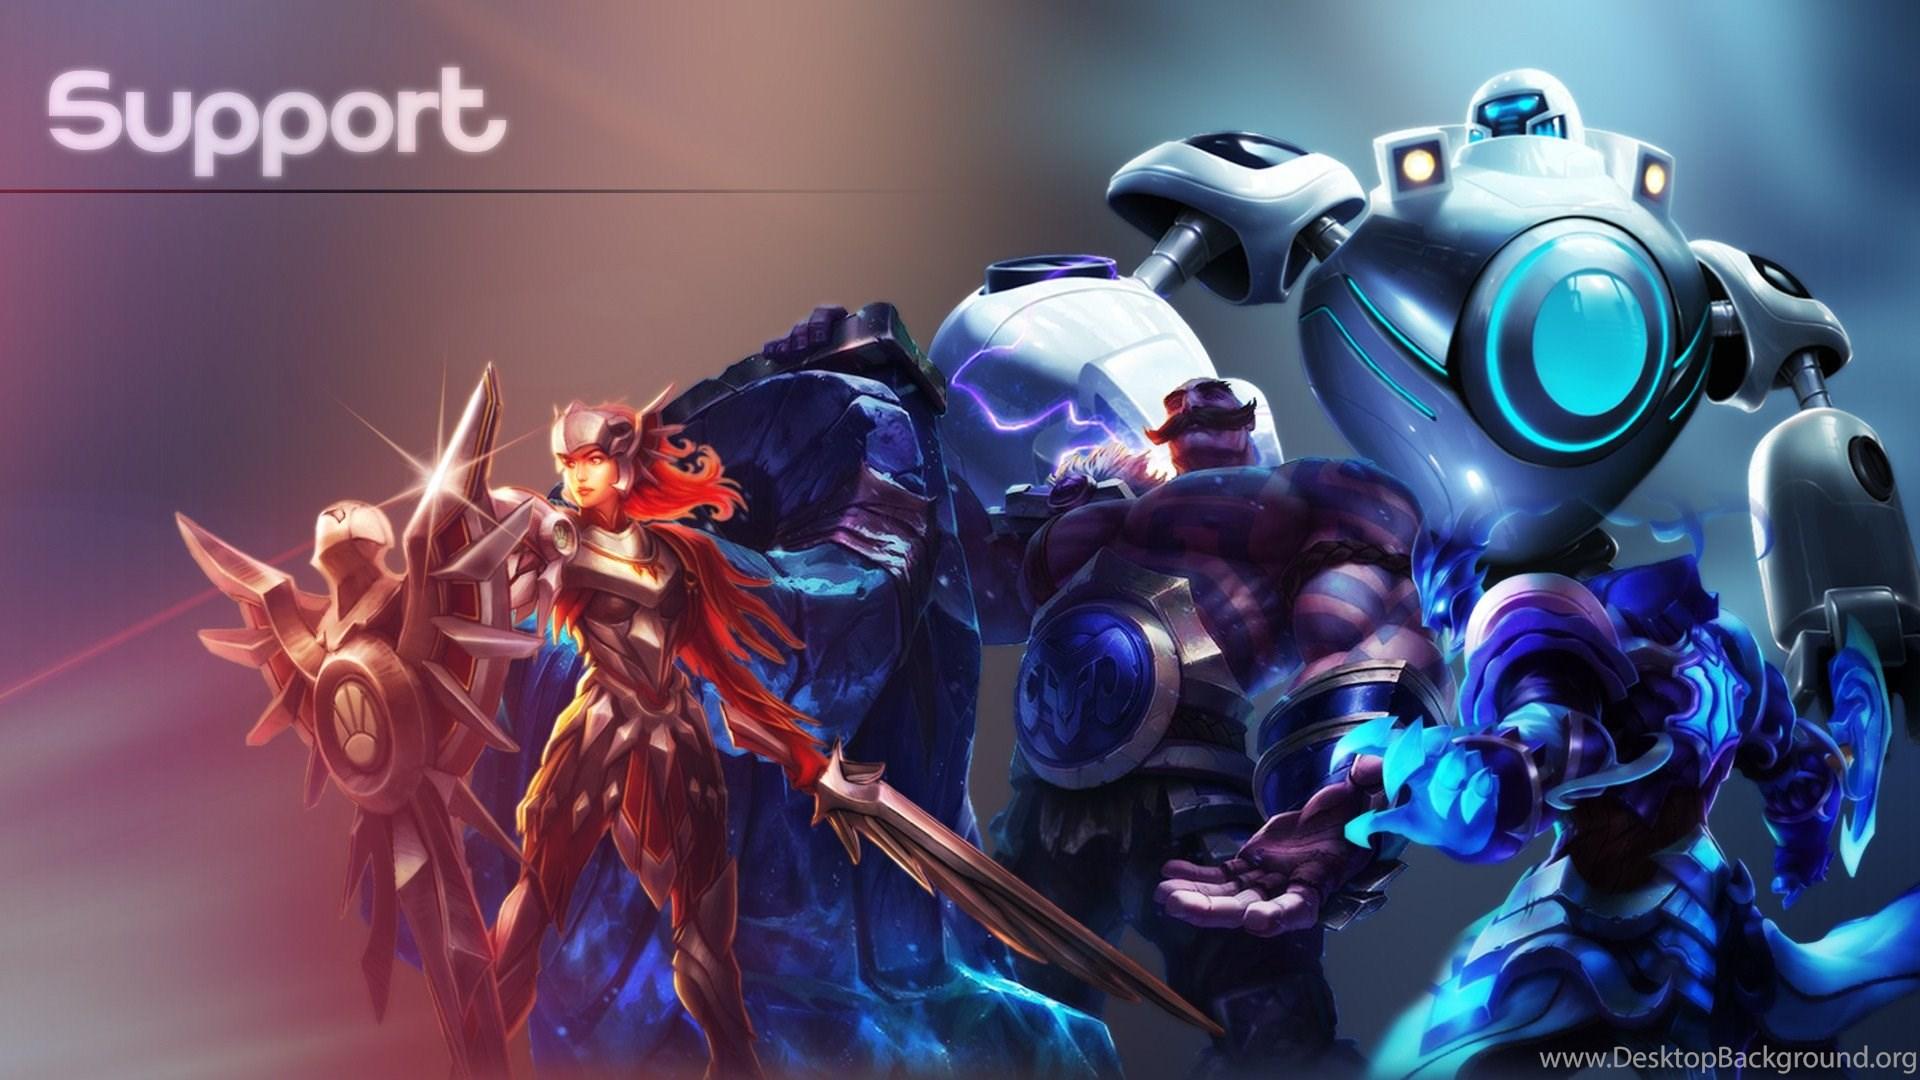 Support Fan Art League Of Legends Wallpapers Desktop Background